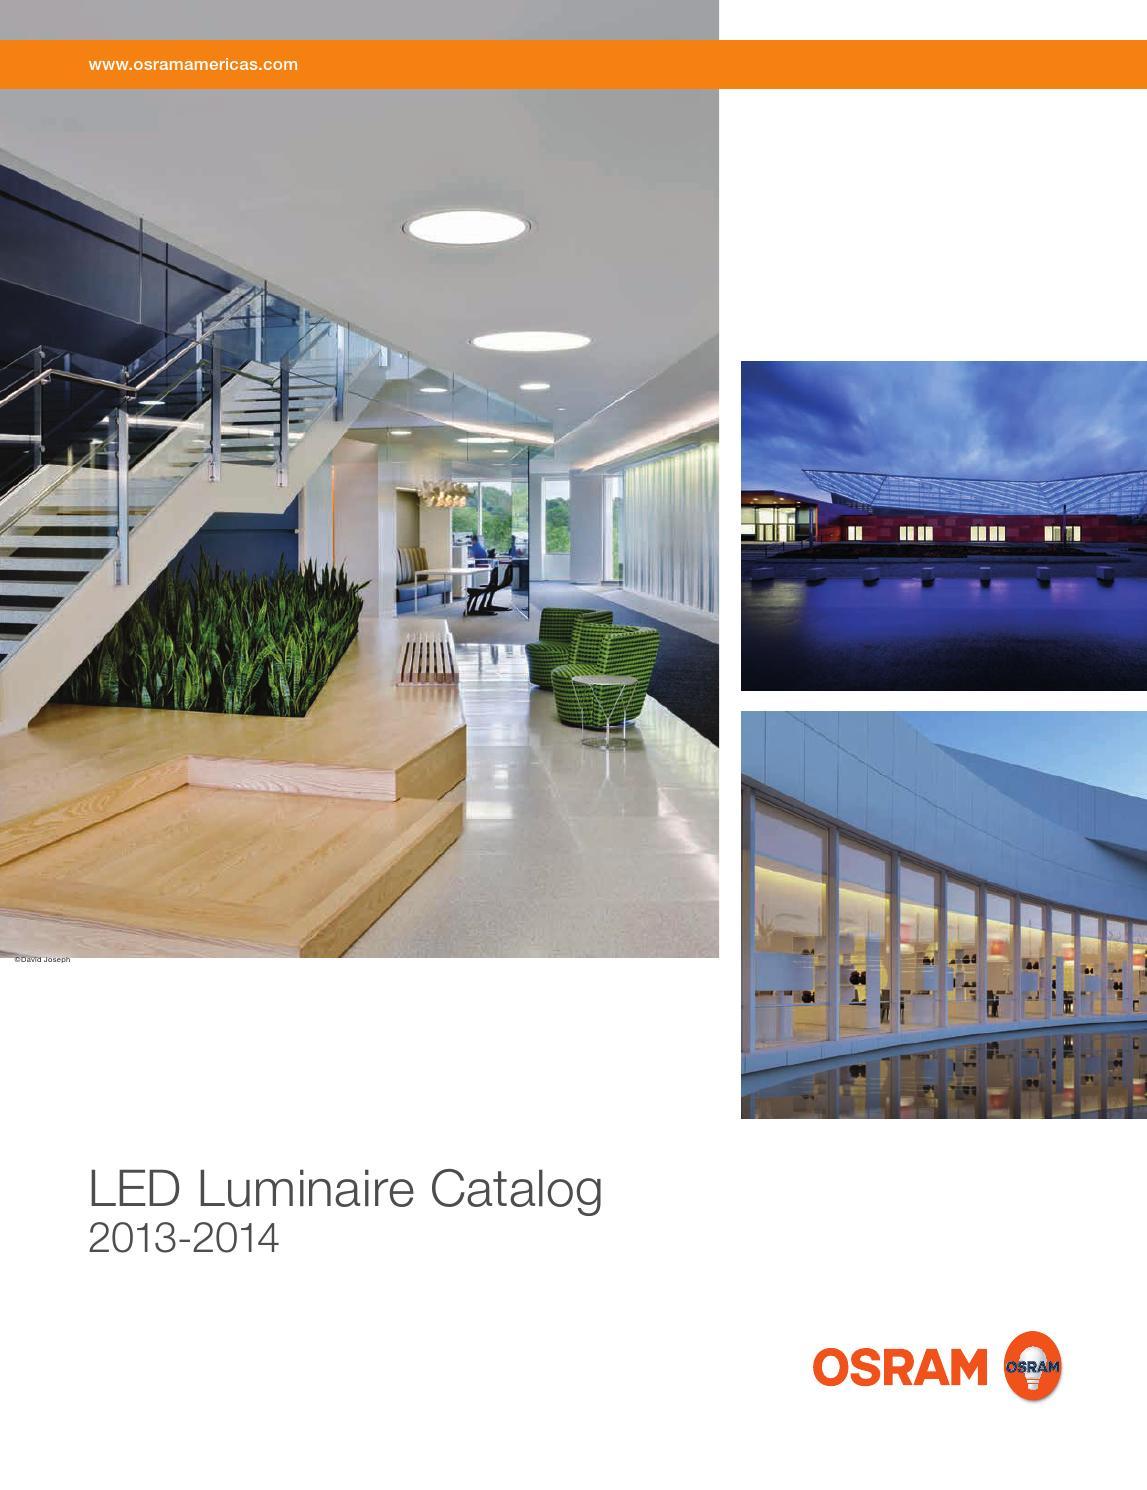 Sylvania 2013 Catalog  Pierlite LED Innovations Catalogue